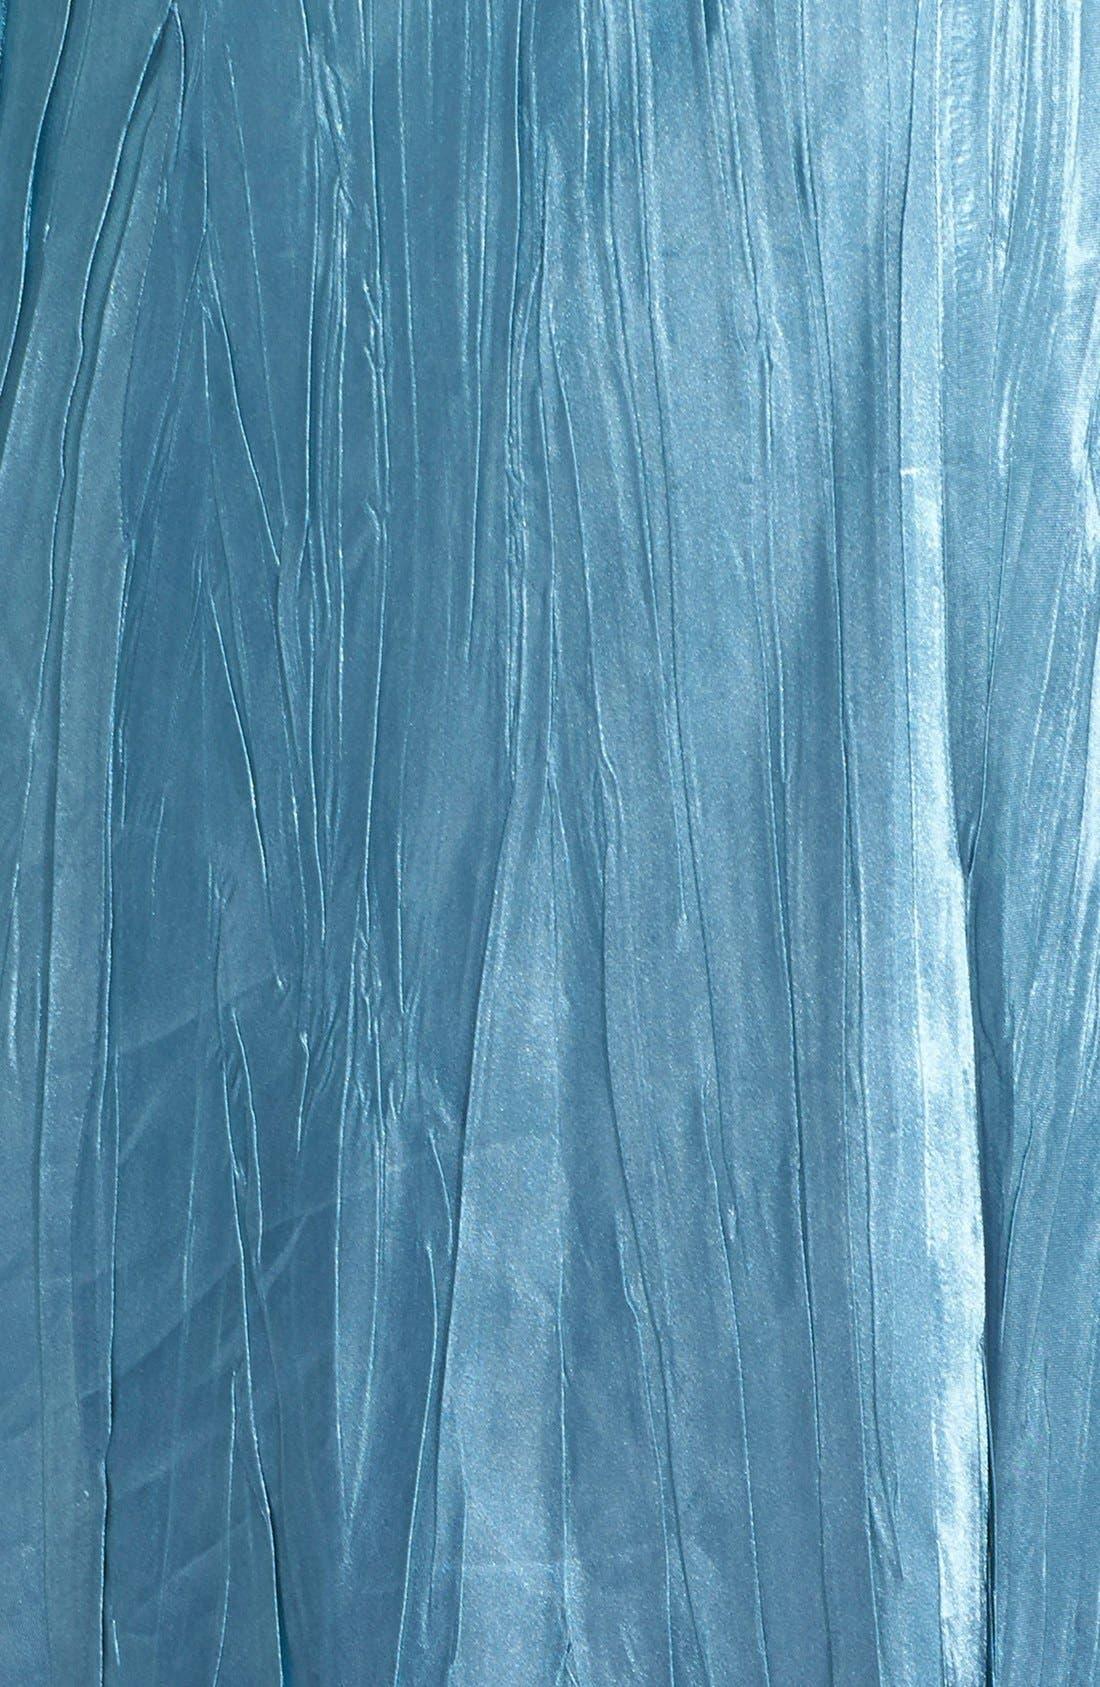 Embellished Charmeuse & Chiffon Dress with Jacket,                             Alternate thumbnail 7, color,                             460